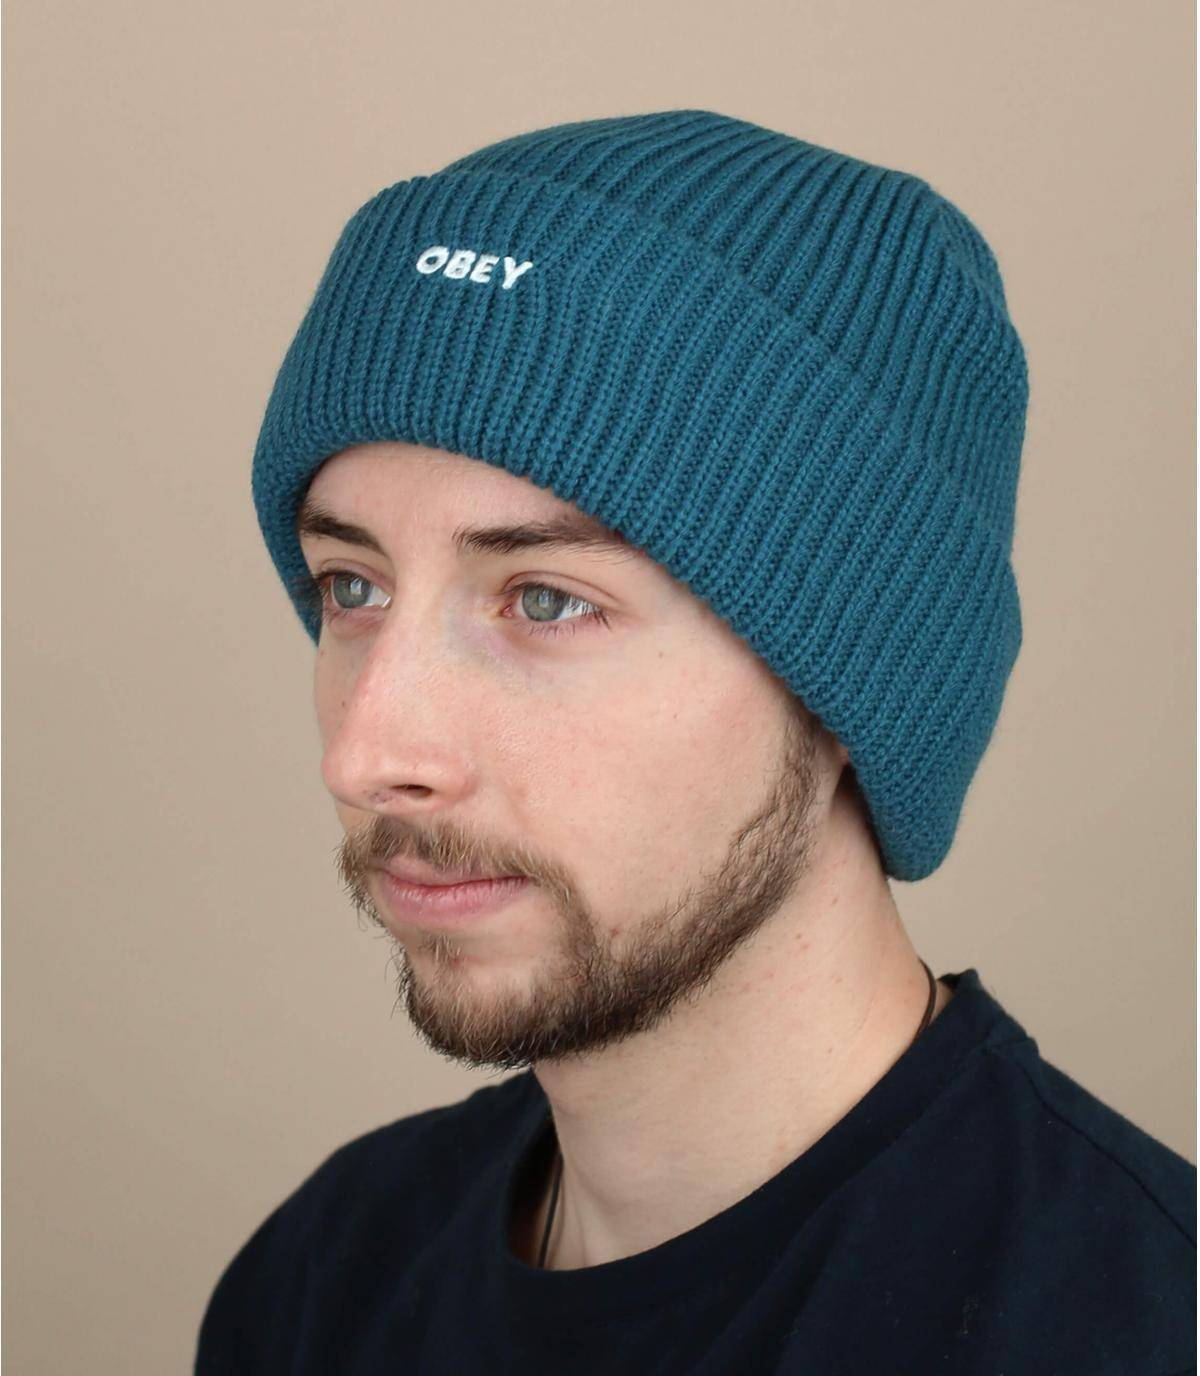 Mütze Obey blau